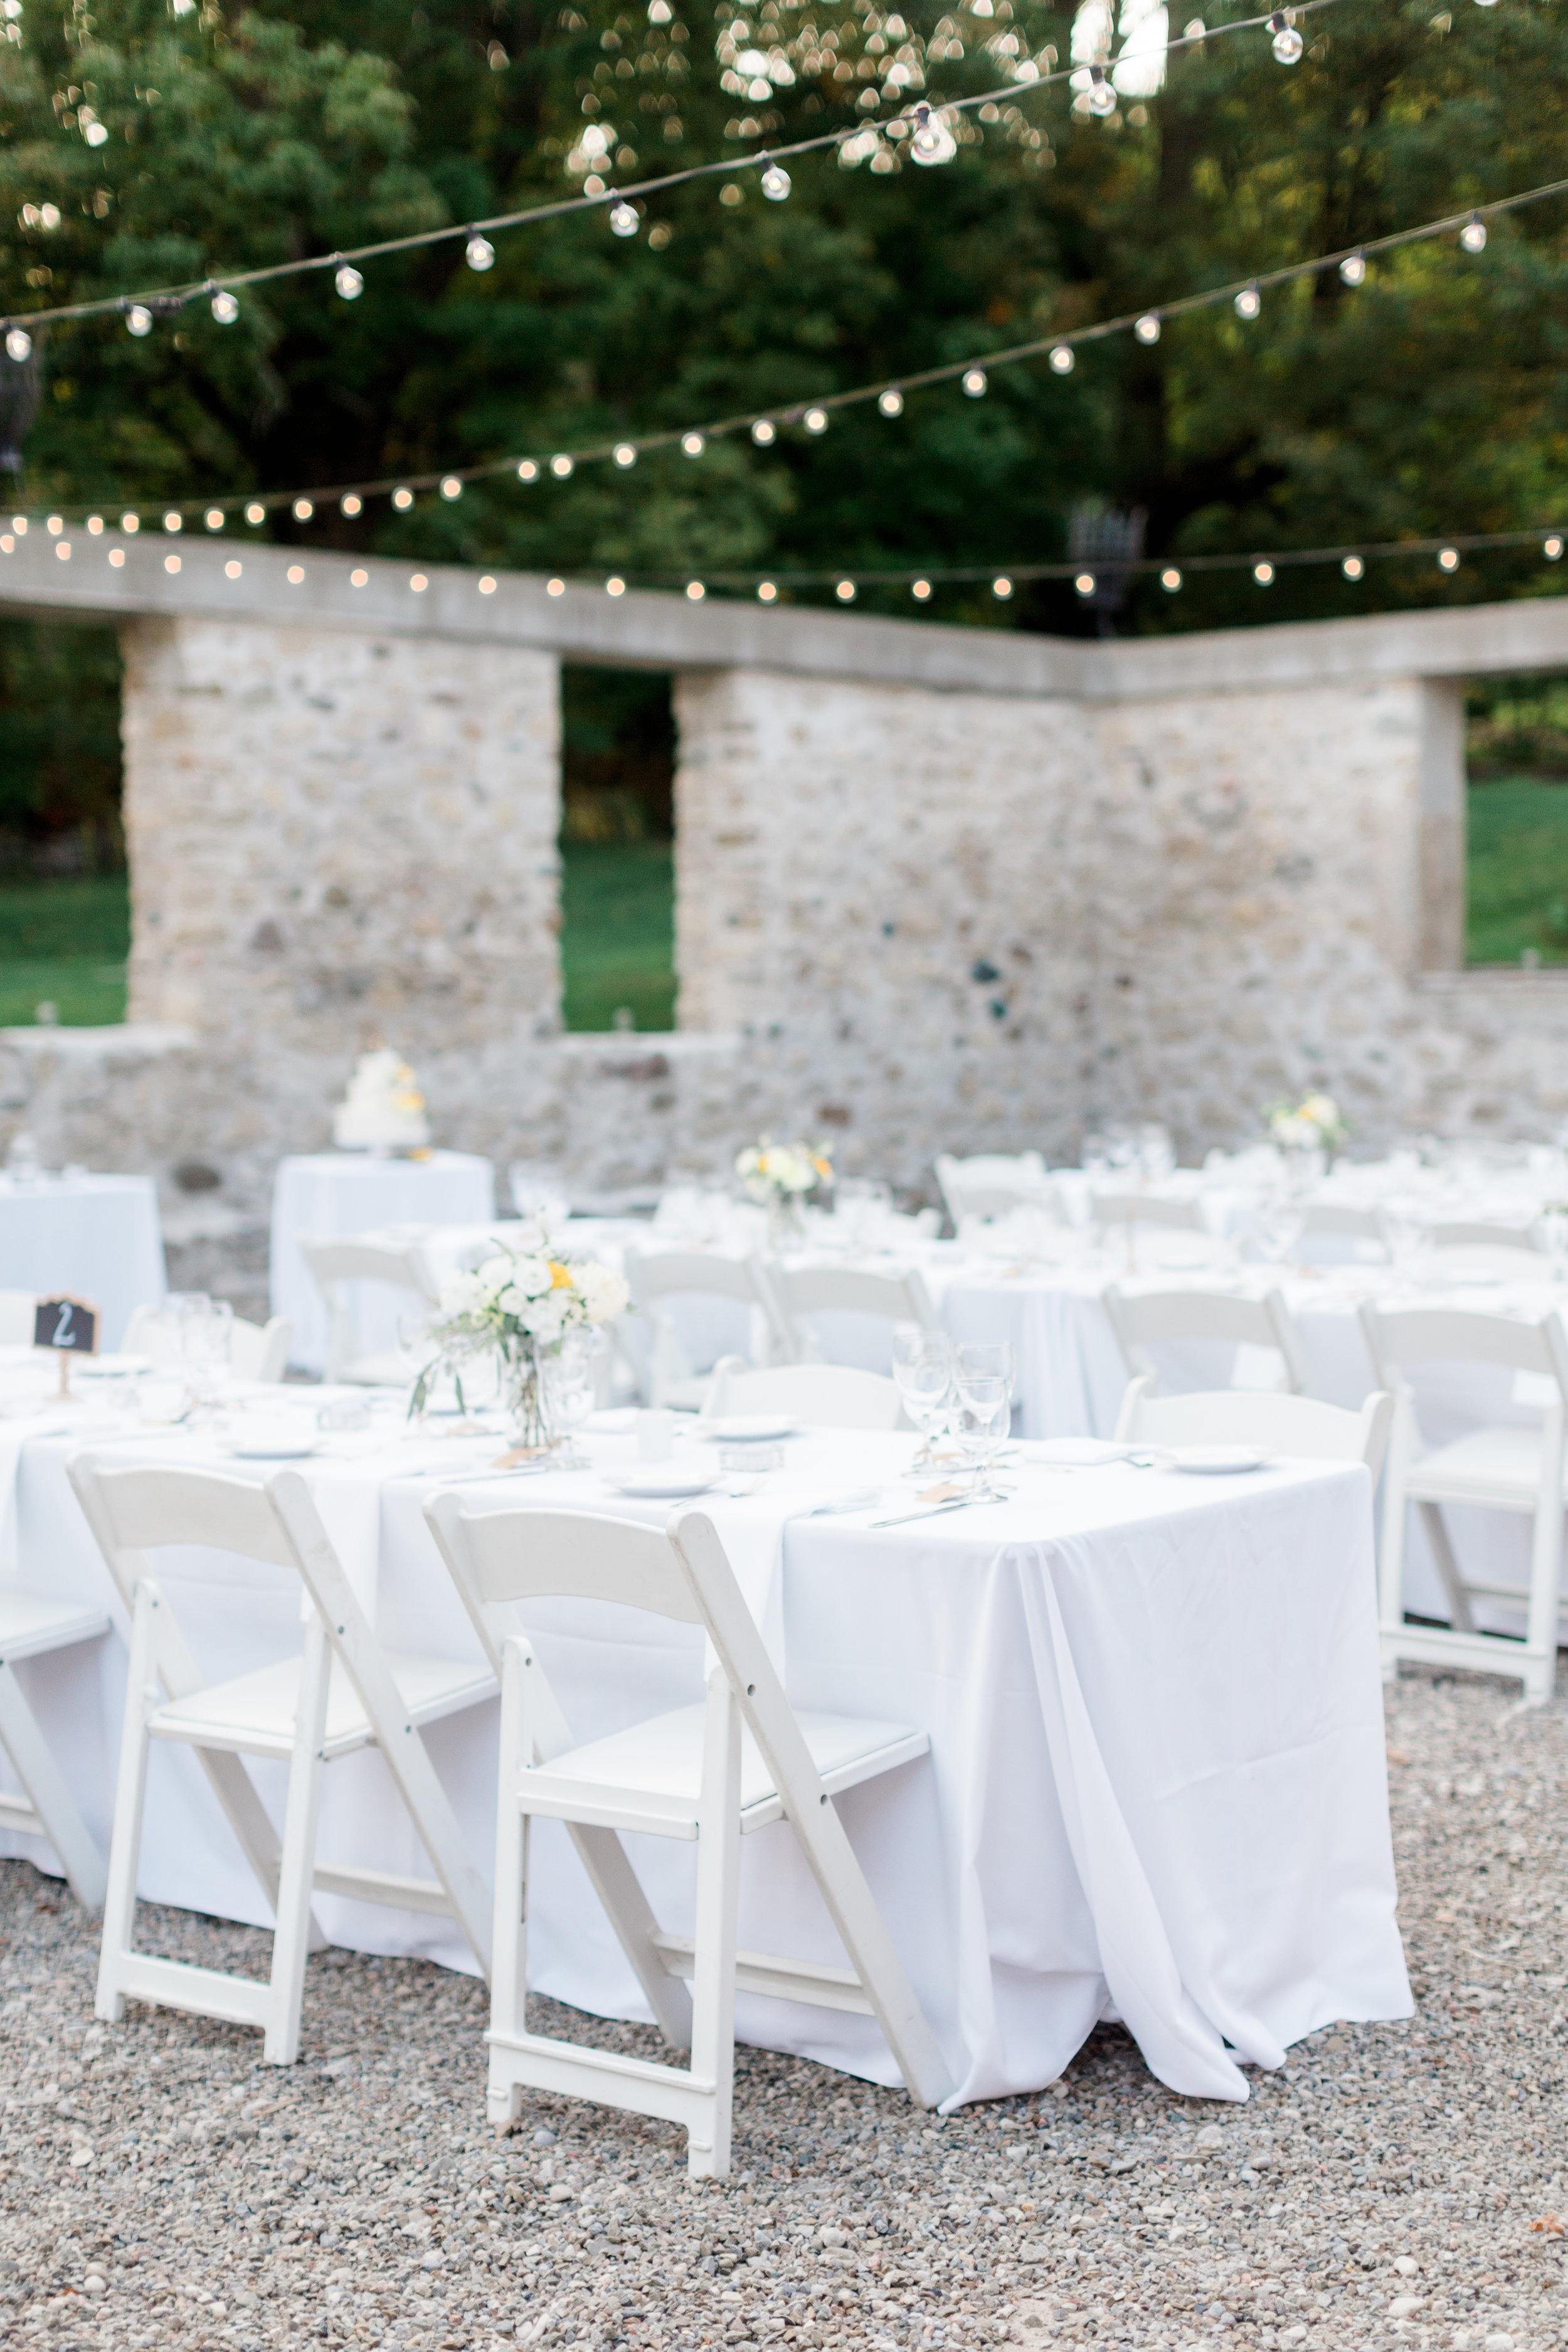 Alton Mills Wedding - Reception-9.jpg